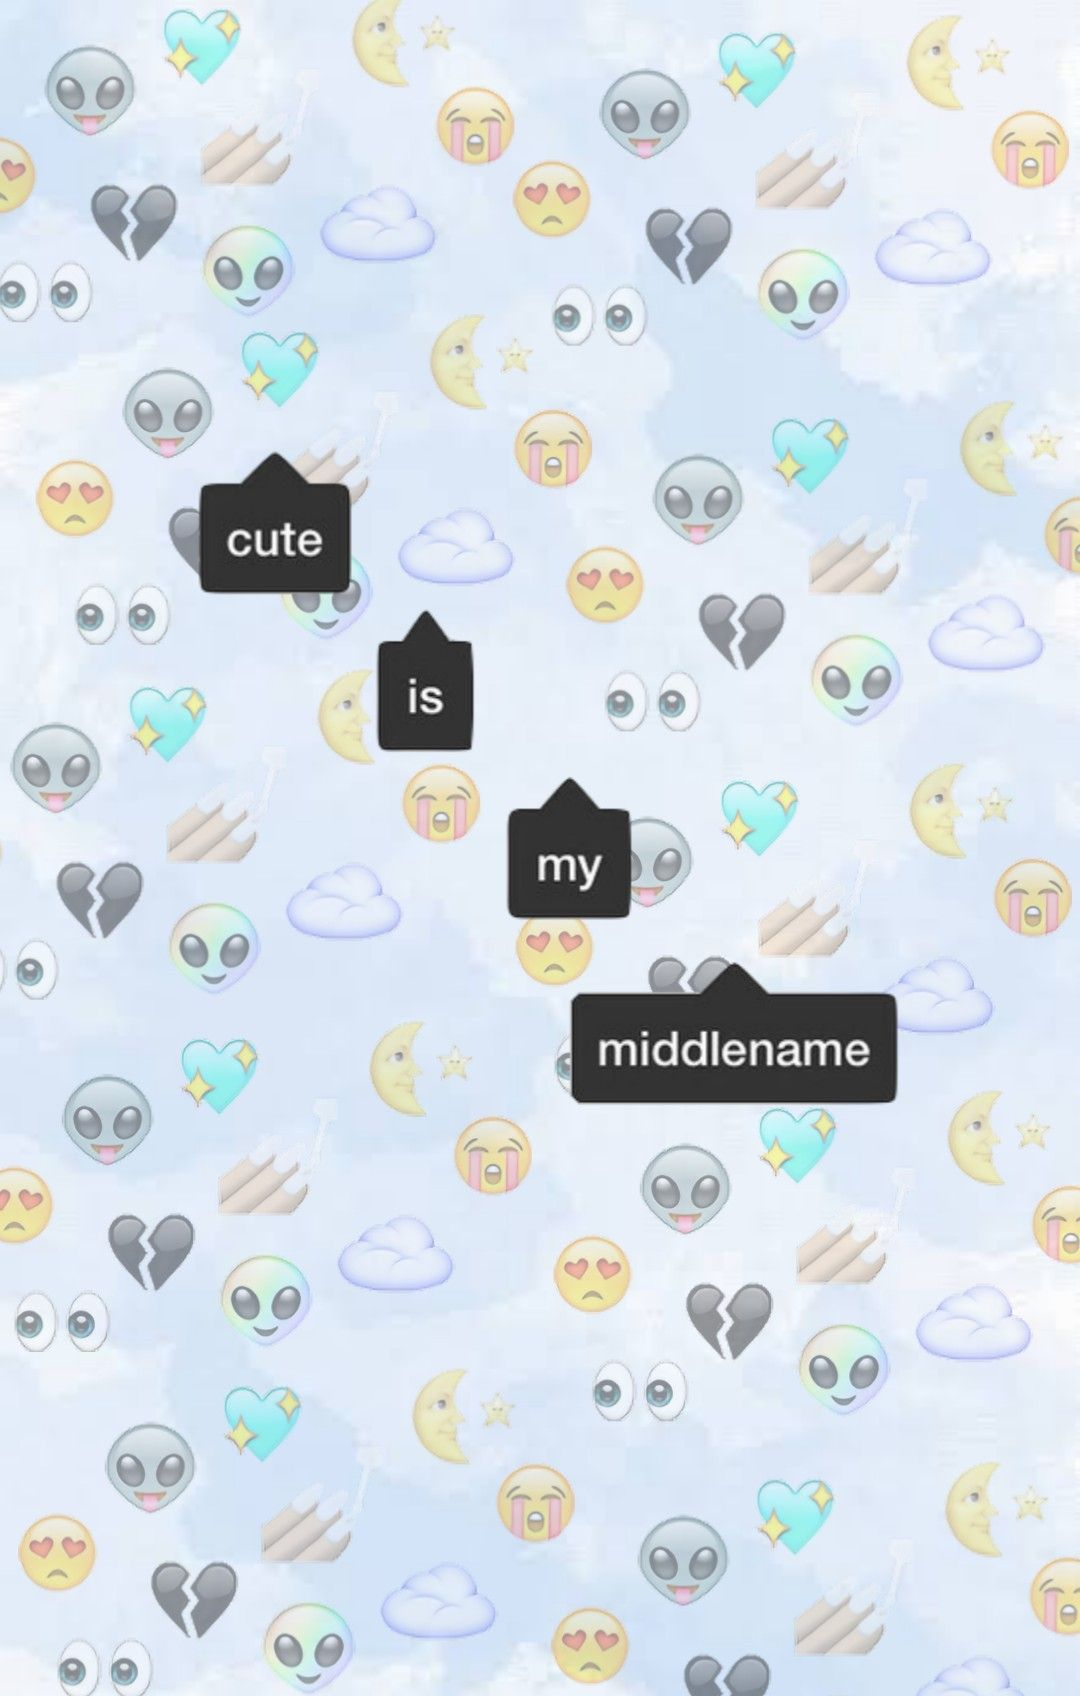 I Dont Give A Credit So Feel Free To Use Emoji Lockscreen